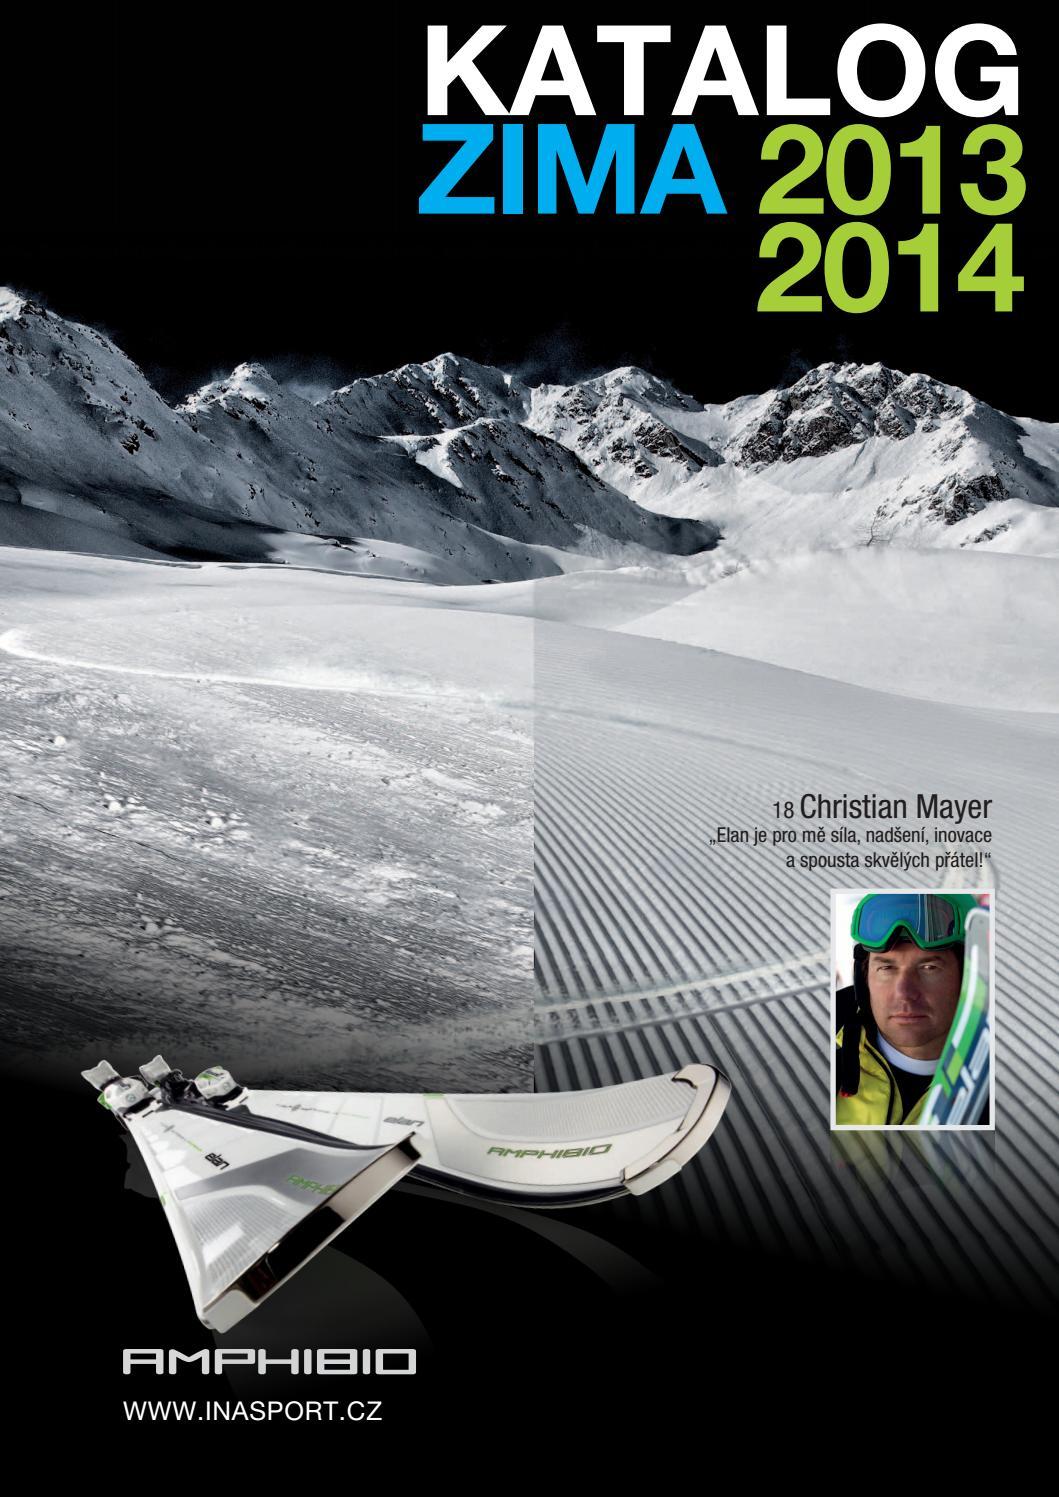 Sportovni katalog zima 2013 2014 by INA SPORT spol. s r.o. - issuu 59914ff01a